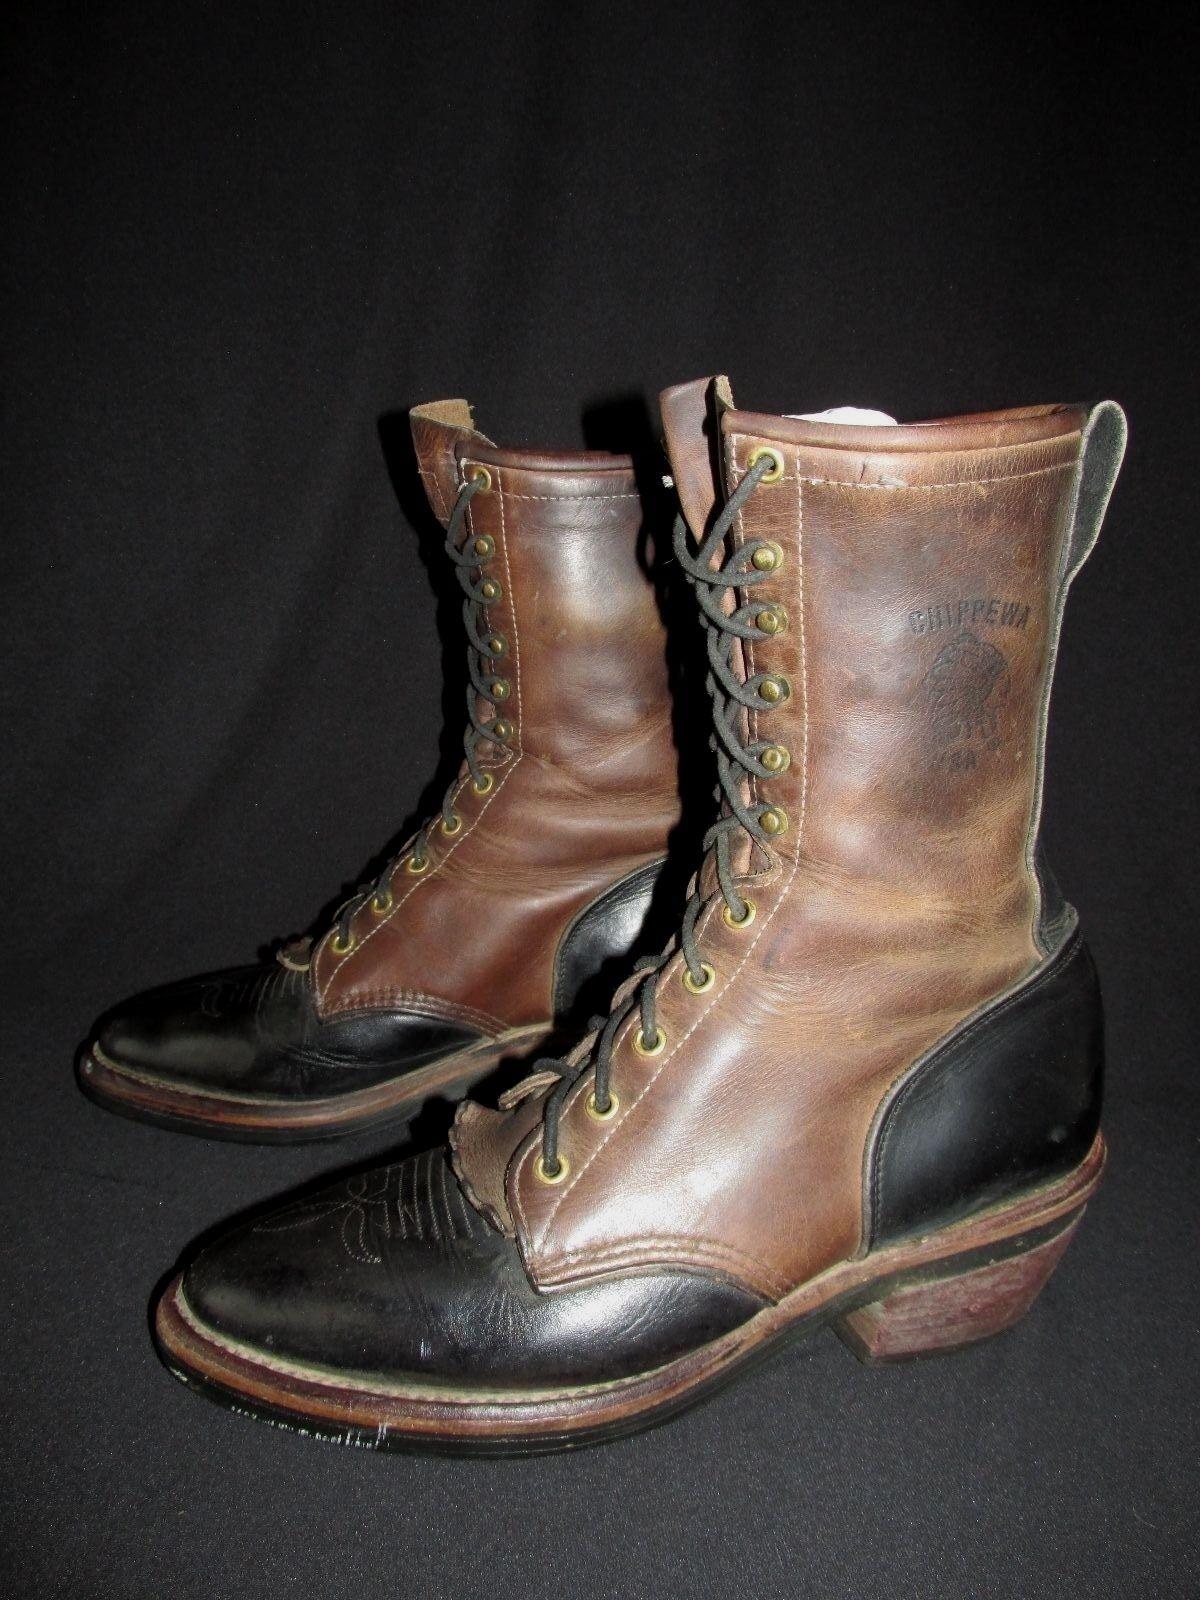 Chippewa Black Brown Kiltie Western Roper Packer Work Boot USA Men's US 8EE